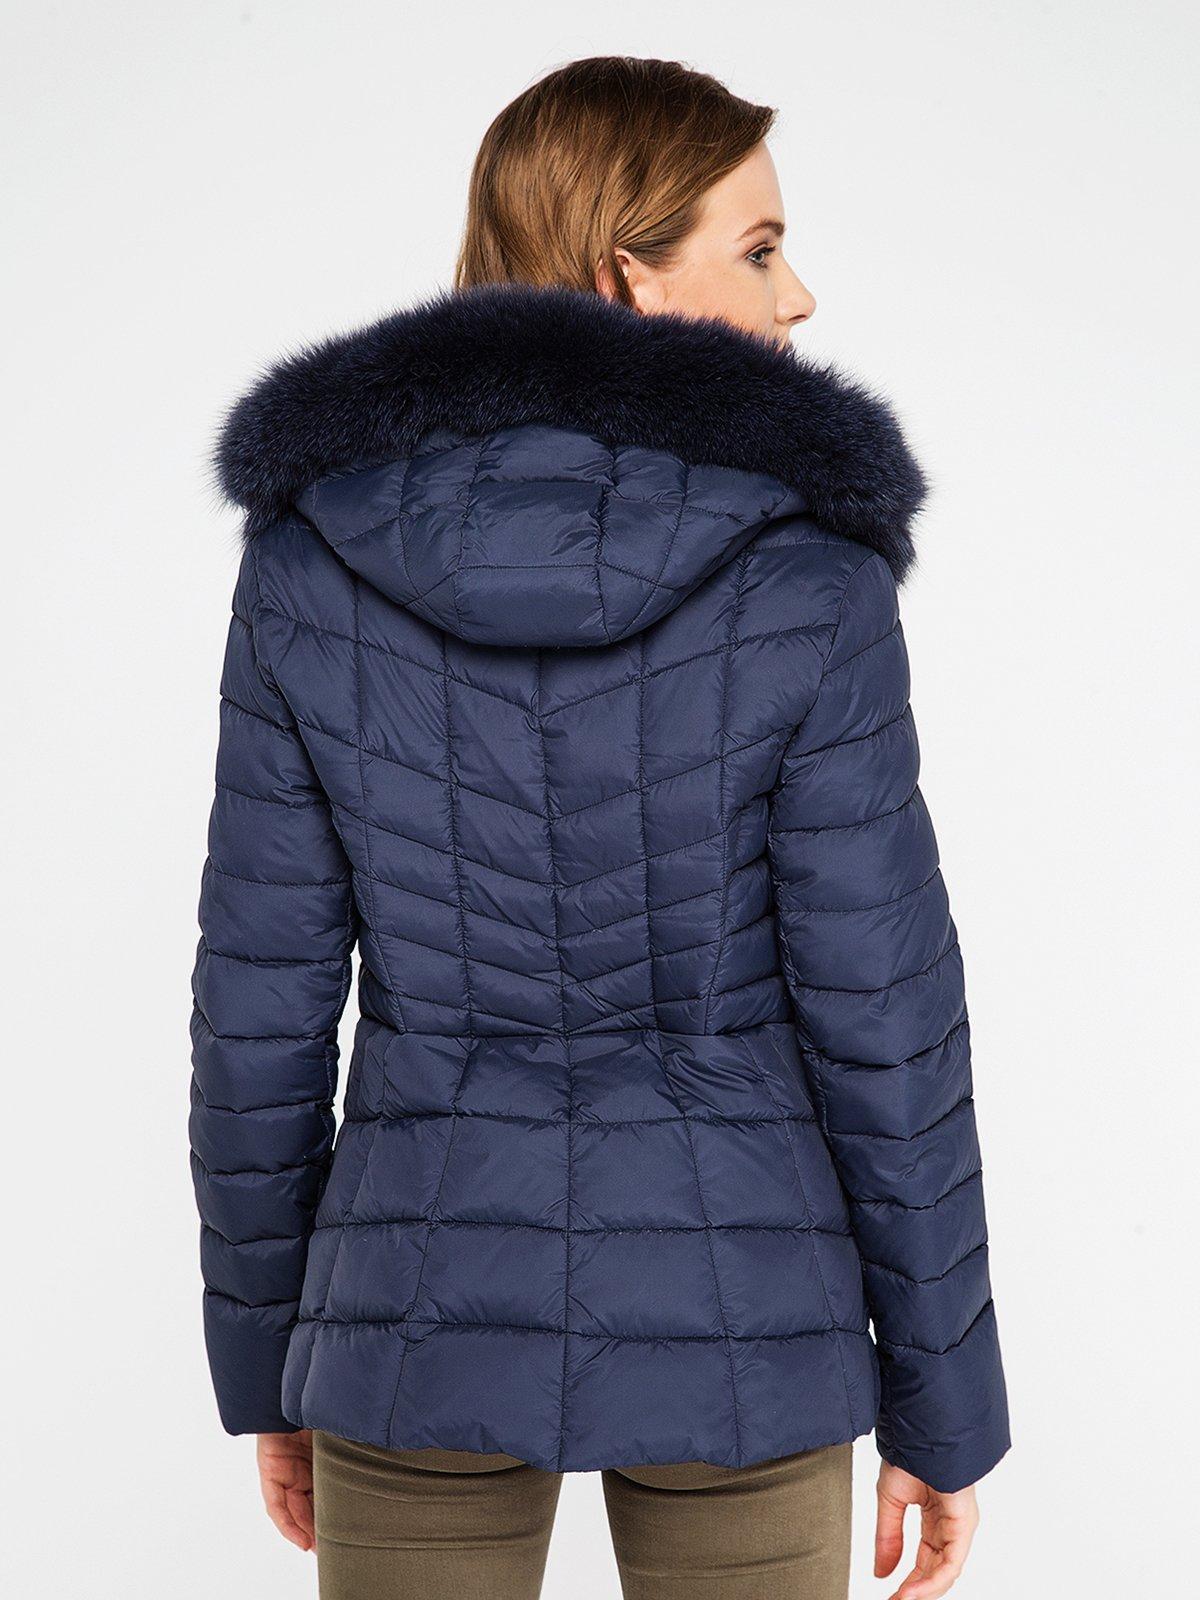 Куртка темно-синяя | 3727296 | фото 4